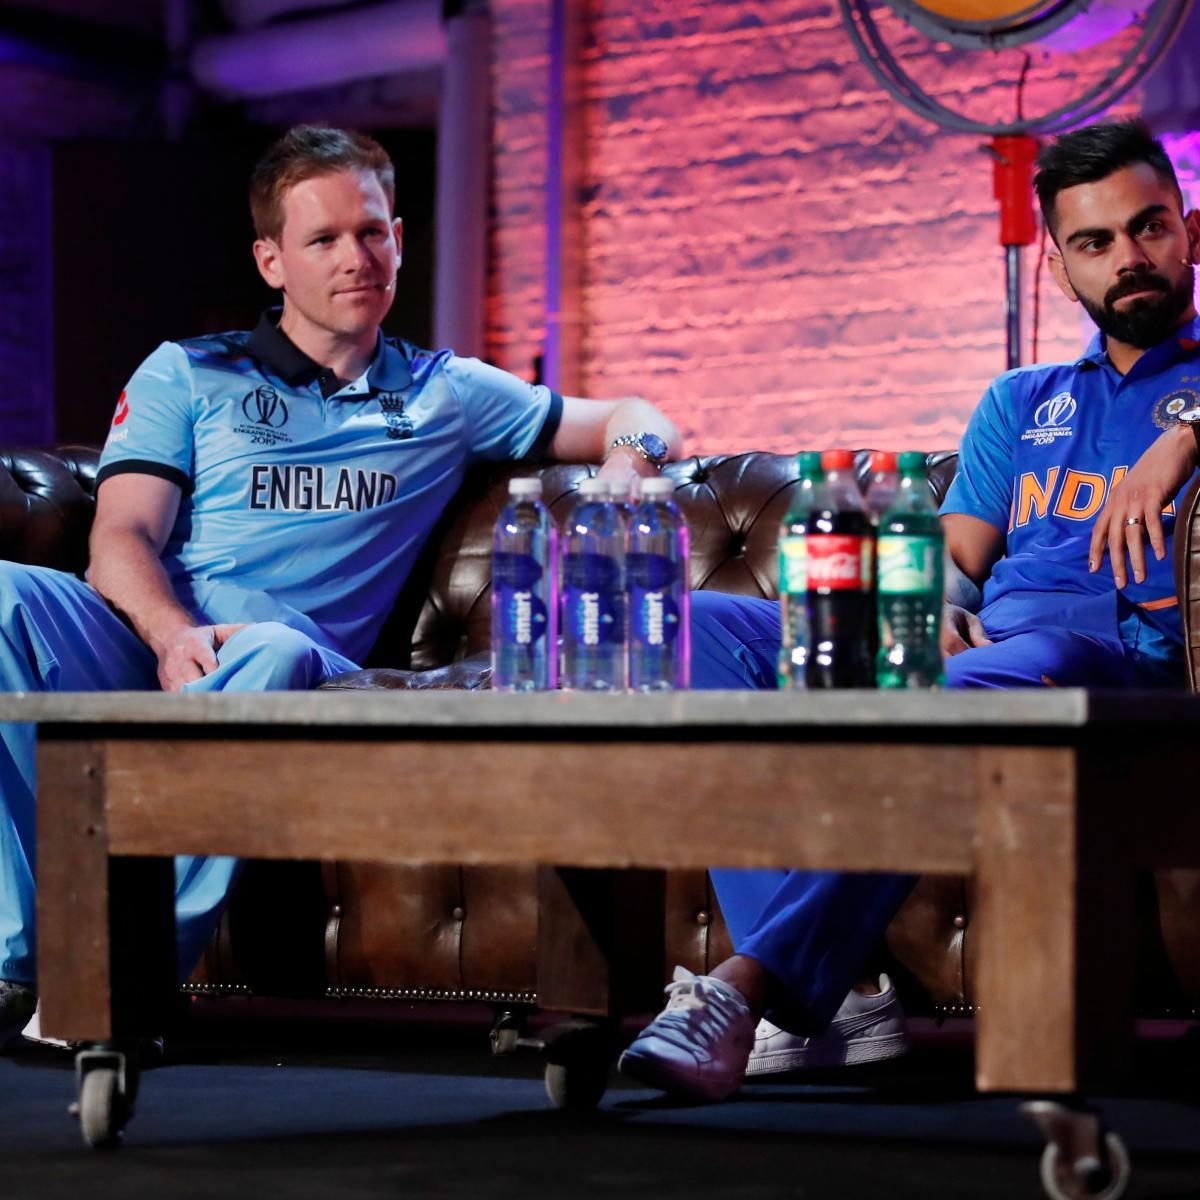 Cricket World Cup 2019 Fixtures Tables Tv Schedule